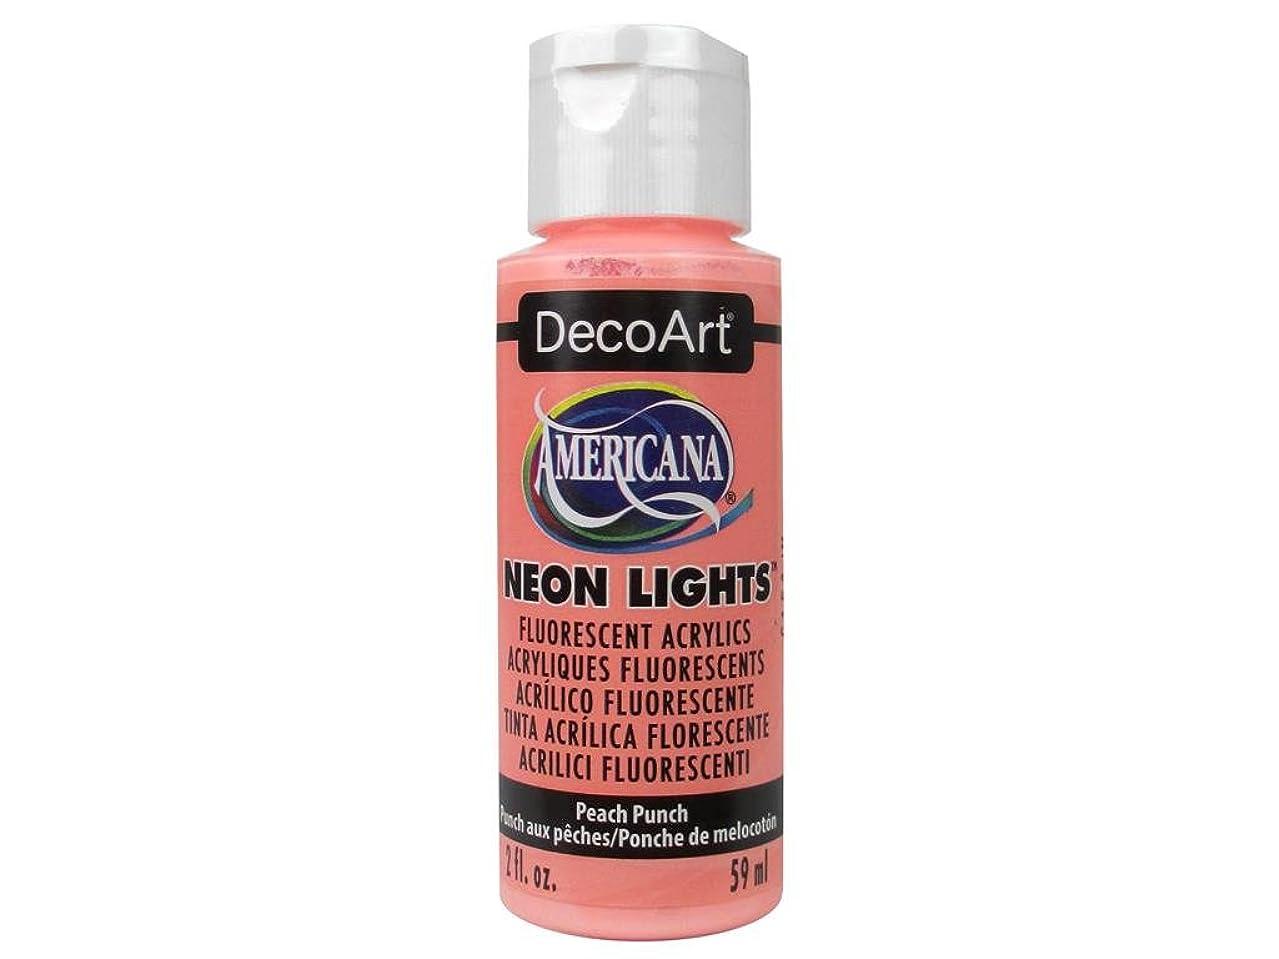 DecoArt Acrylic Neon Lights 2oz, 2 oz